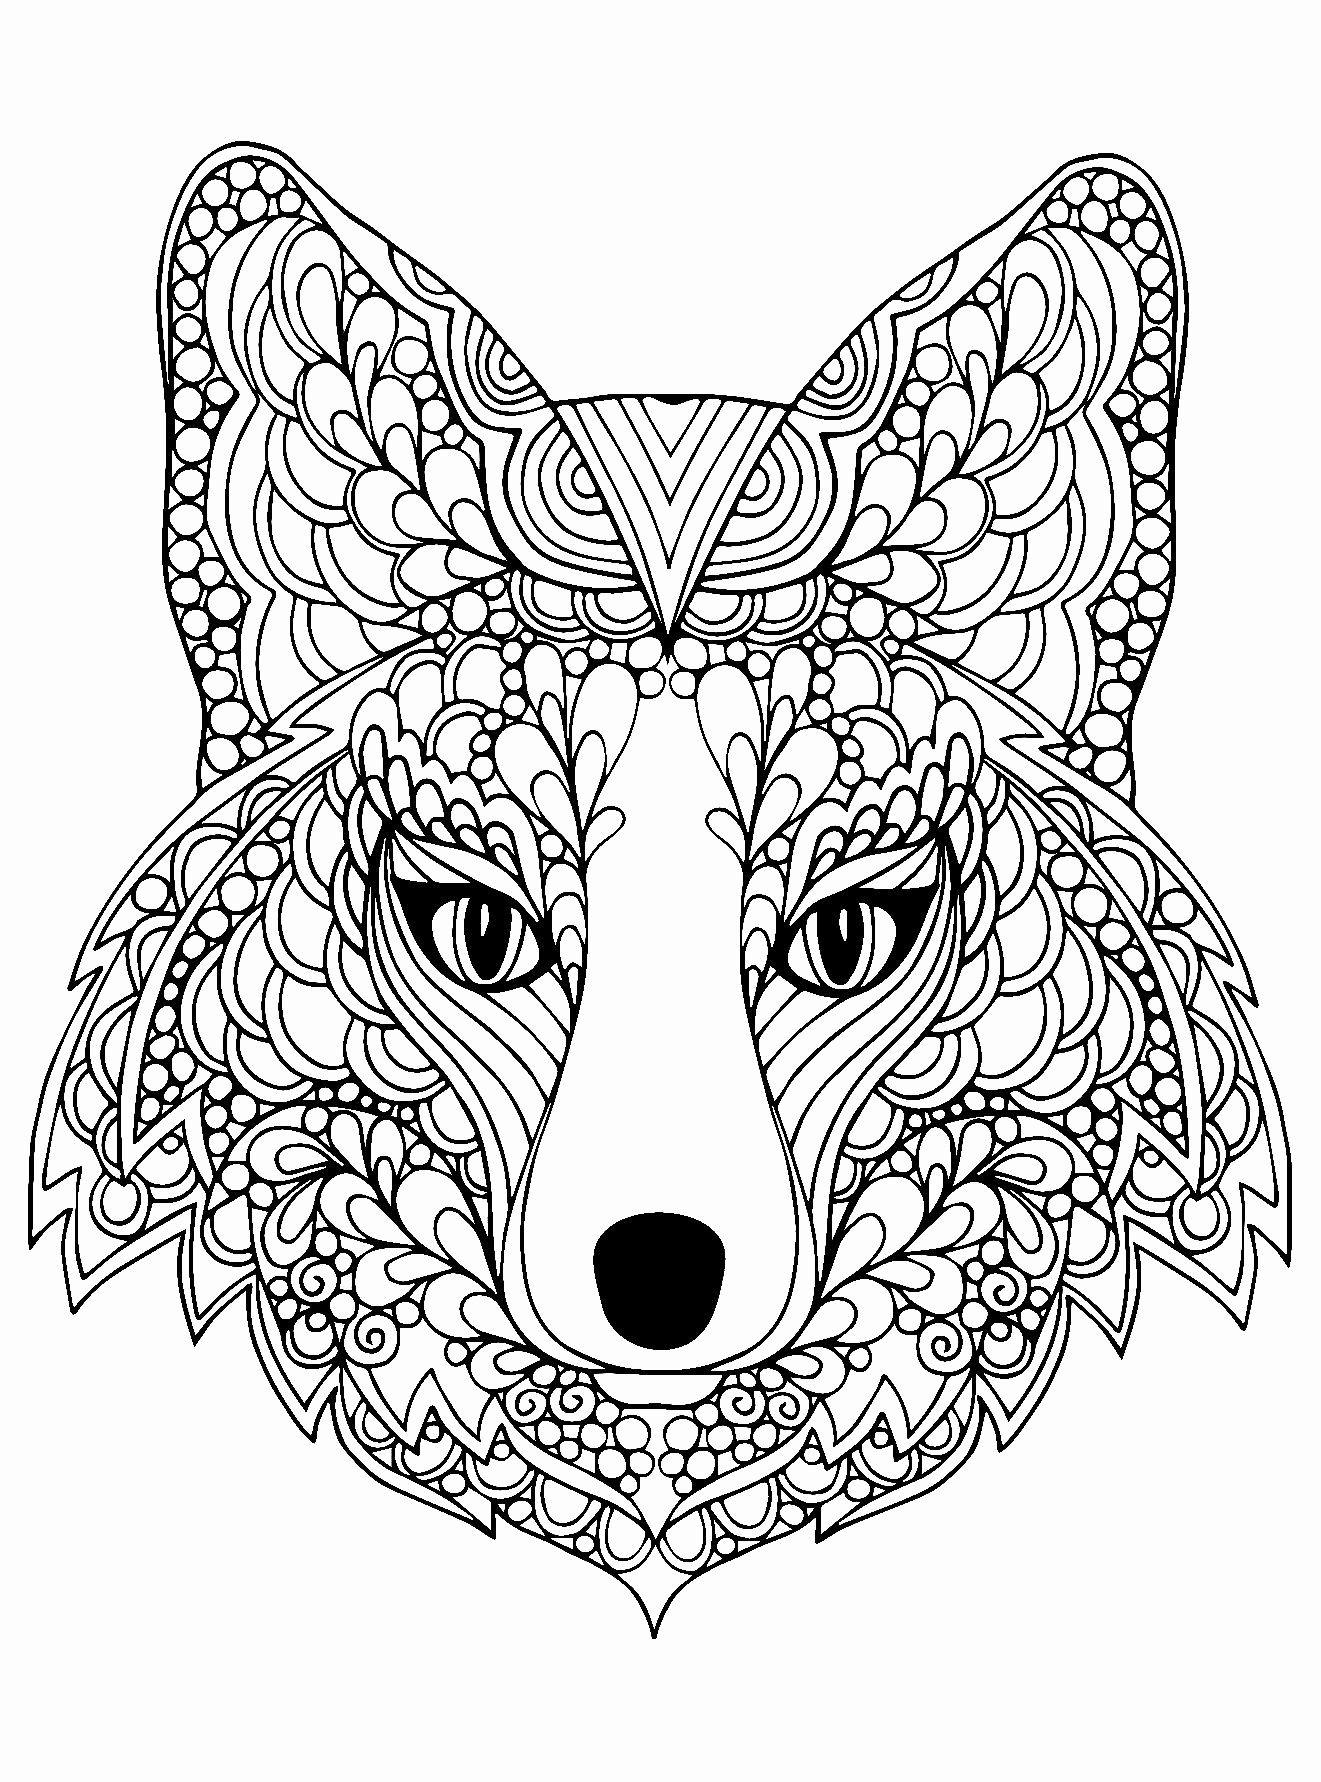 Animal Coloring Sheets Hard Elegant Coloring Free Printable Hard Christmas Coloring Fox Coloring Page Animal Coloring Pages Mandala Coloring Pages